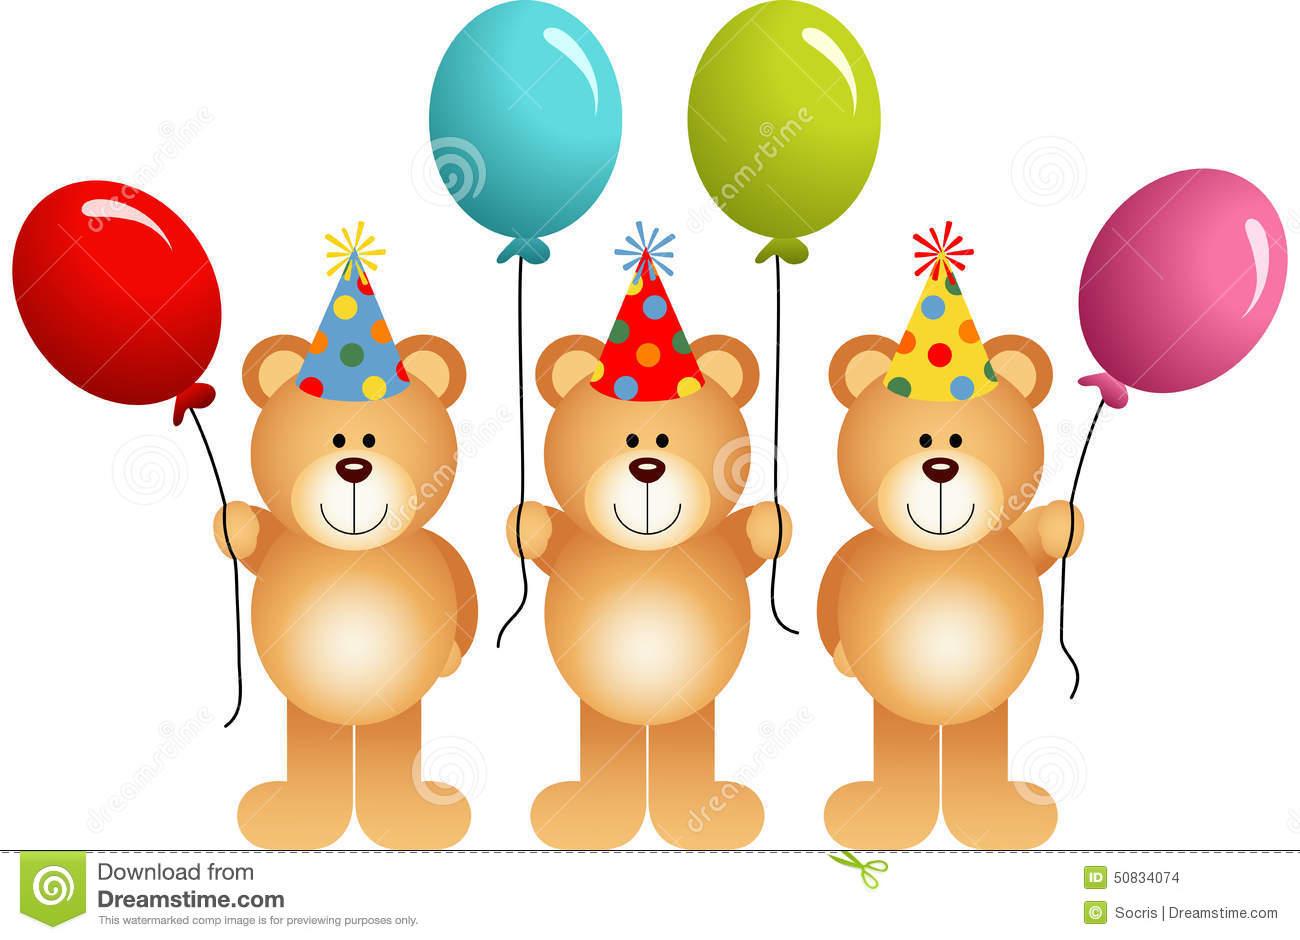 Birthday Balloon with Teddy Bear